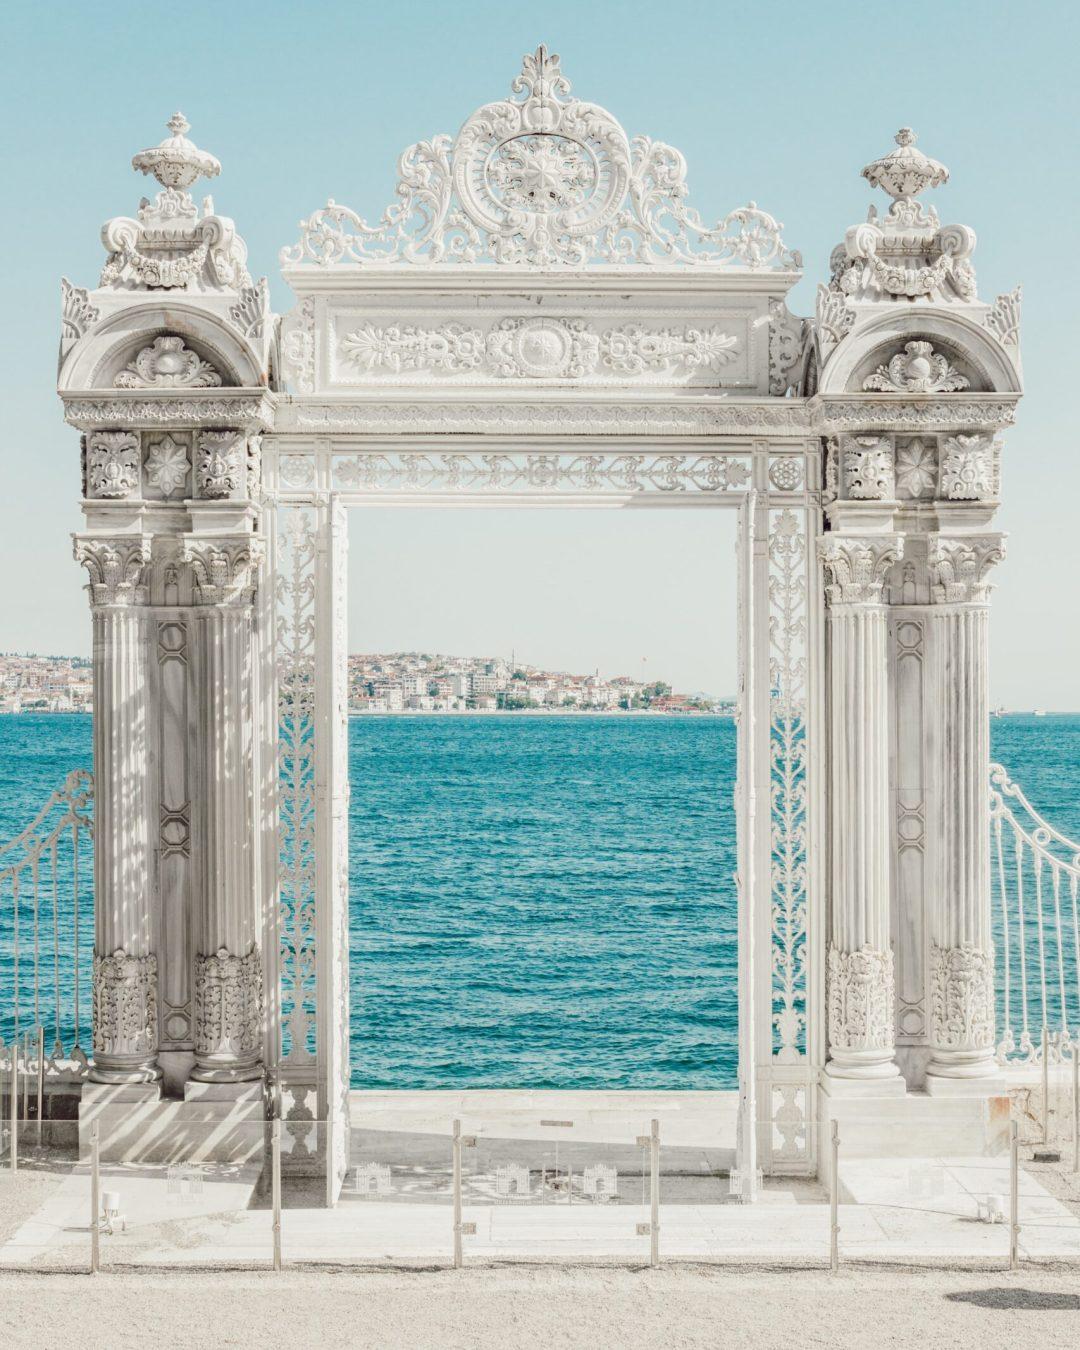 bosphorus gate